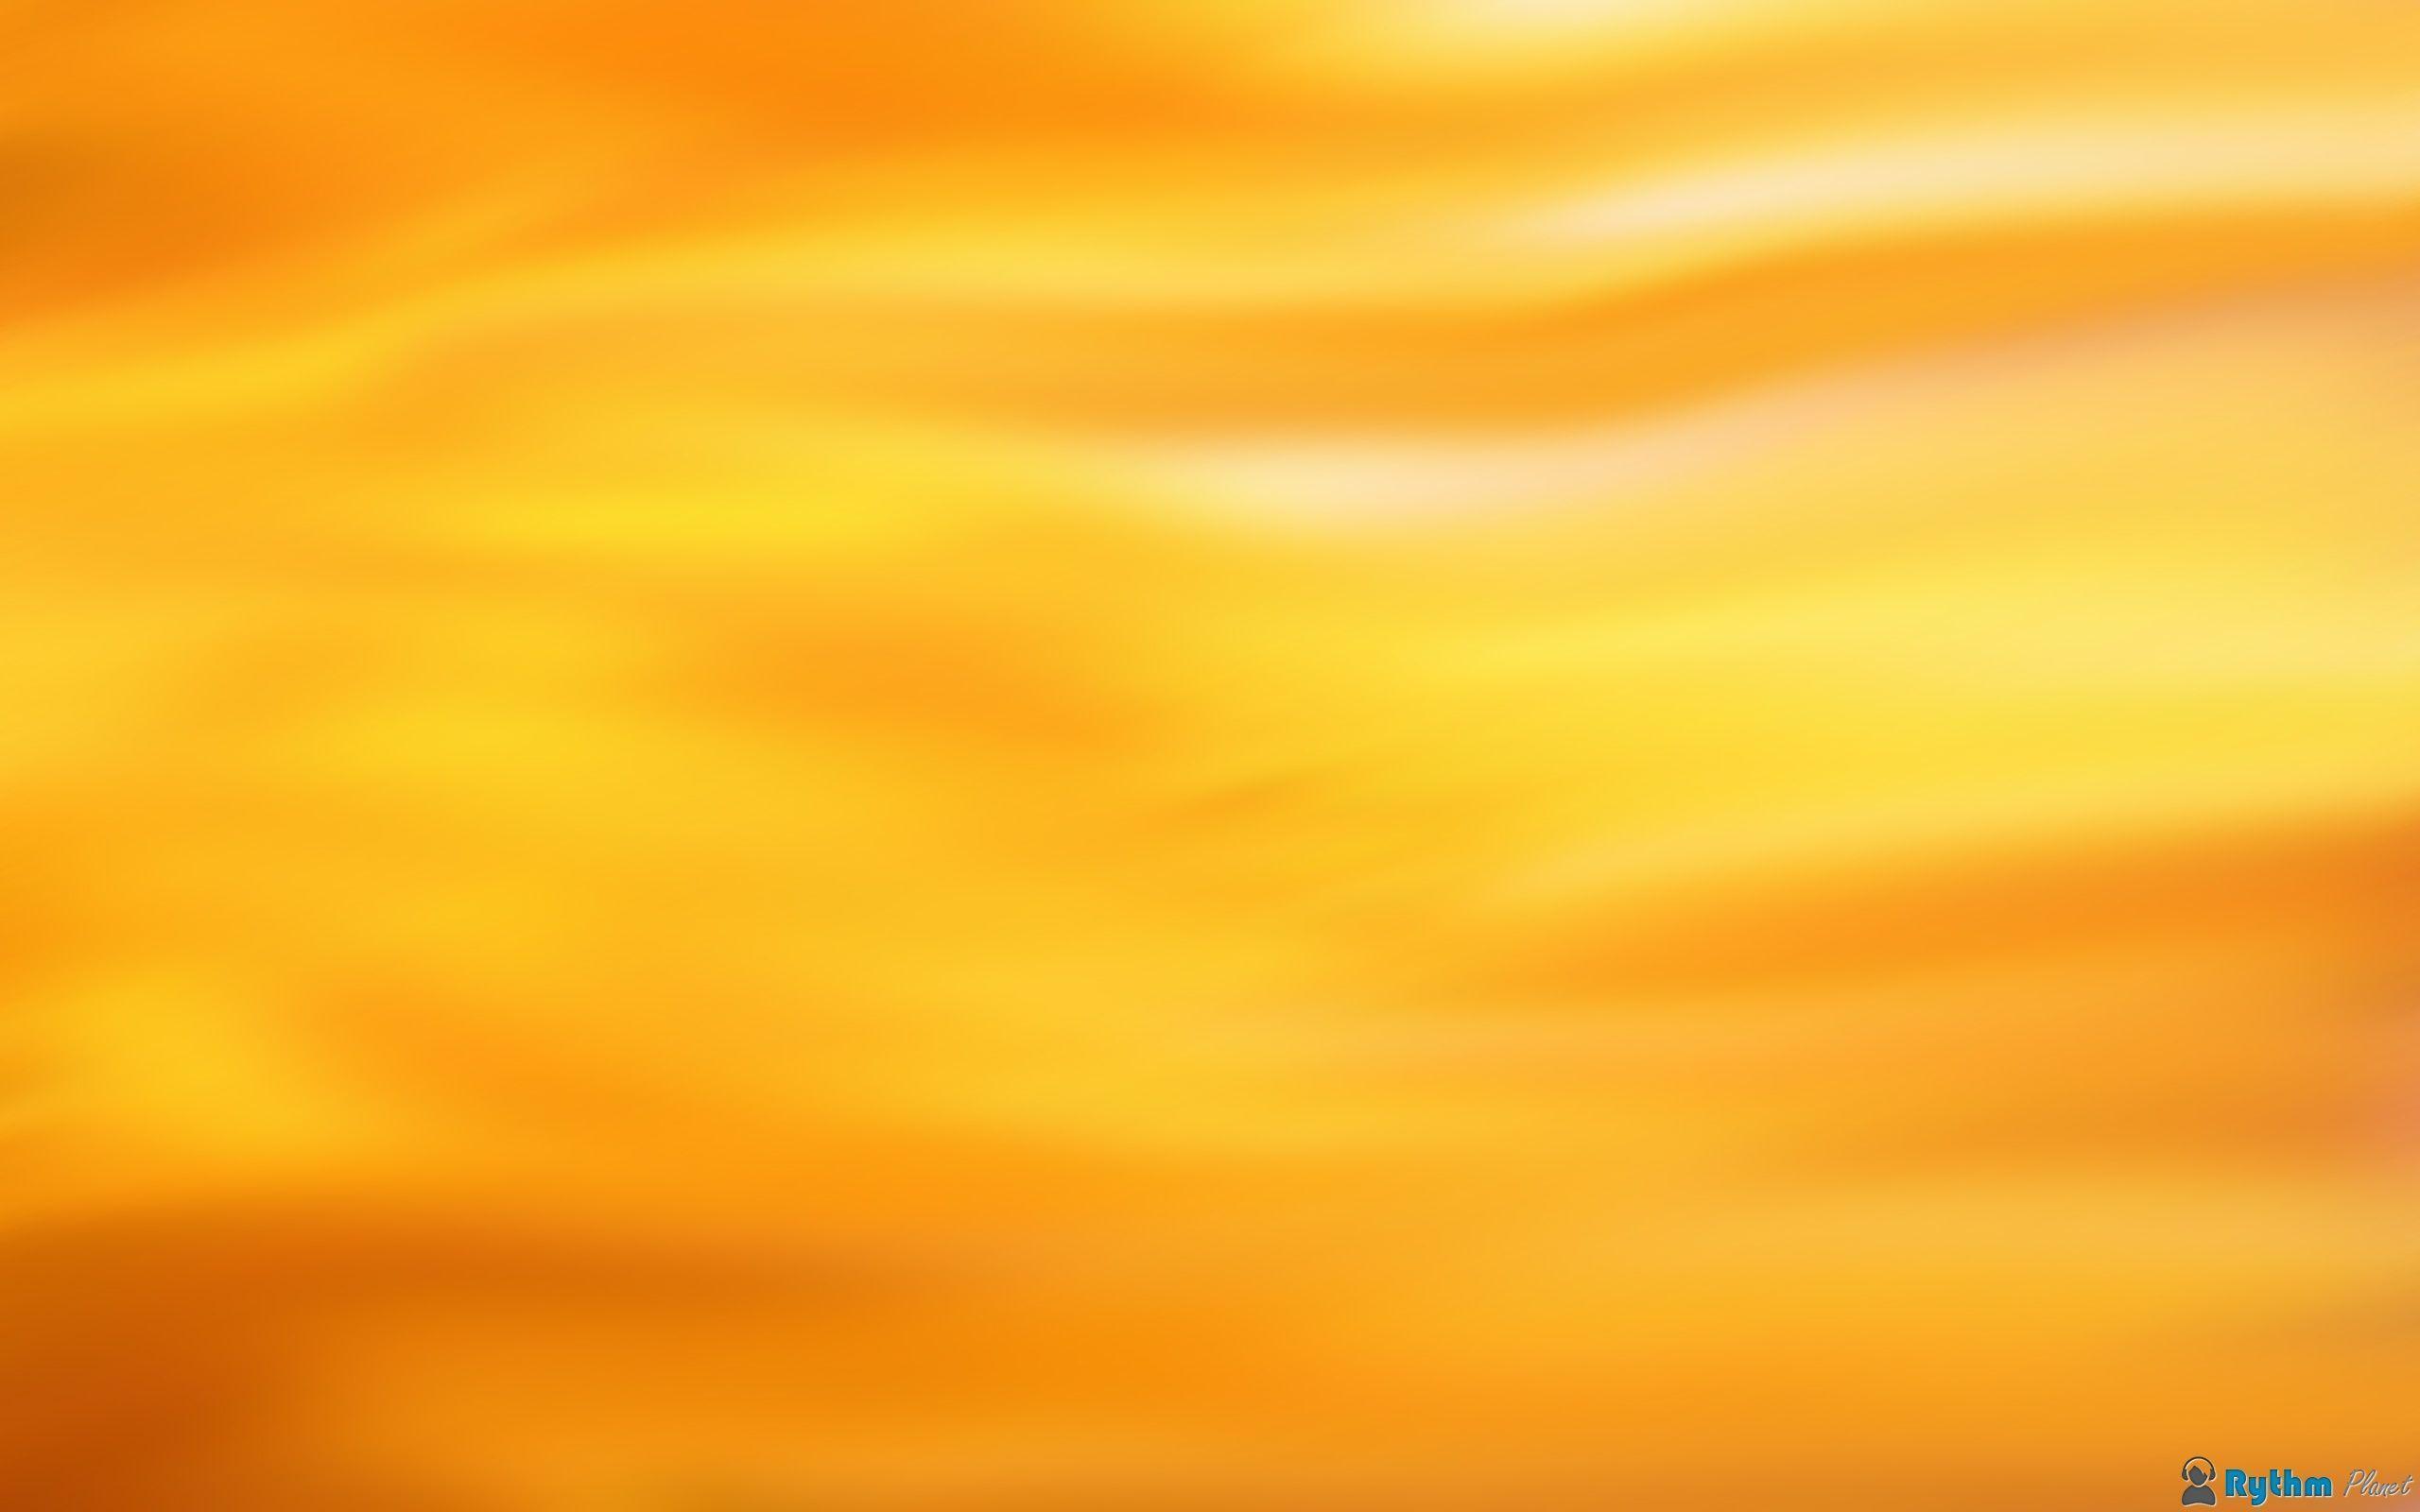 Hd wallpaper colour - Yellow Colour Hd Wallpapers Hd Wallpapers Inn